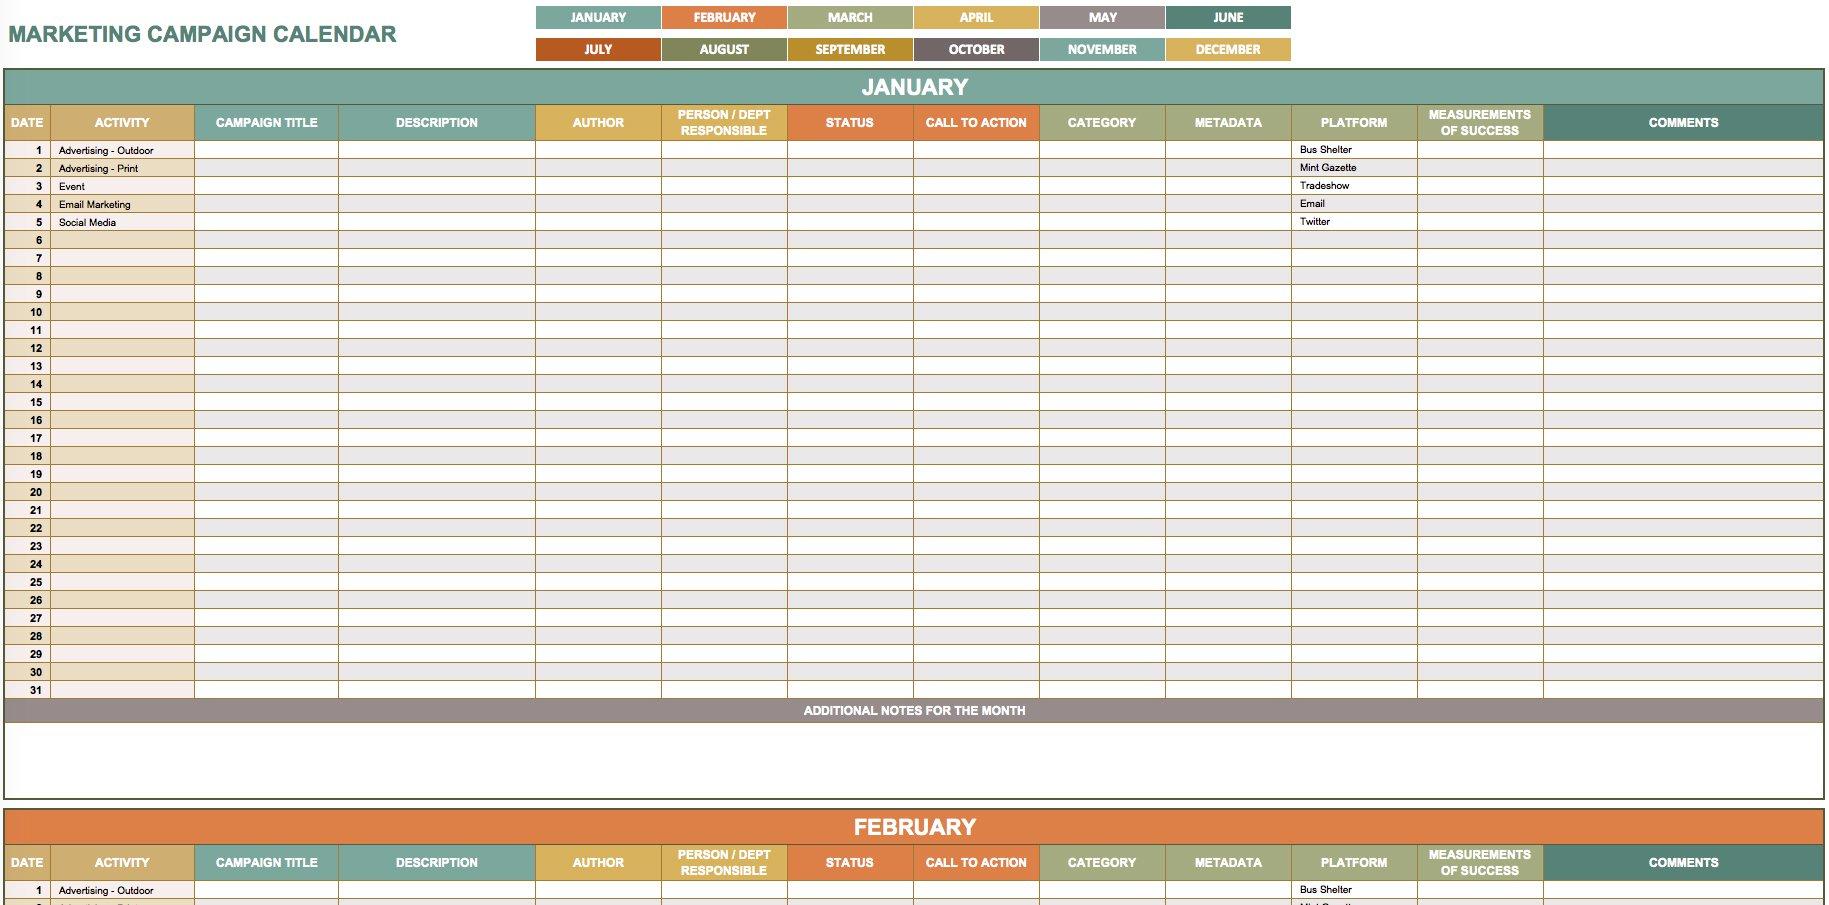 9 Free Marketing Calendar Templates For Excel - Smartsheet in Social Media Content Plan Excel Template Free